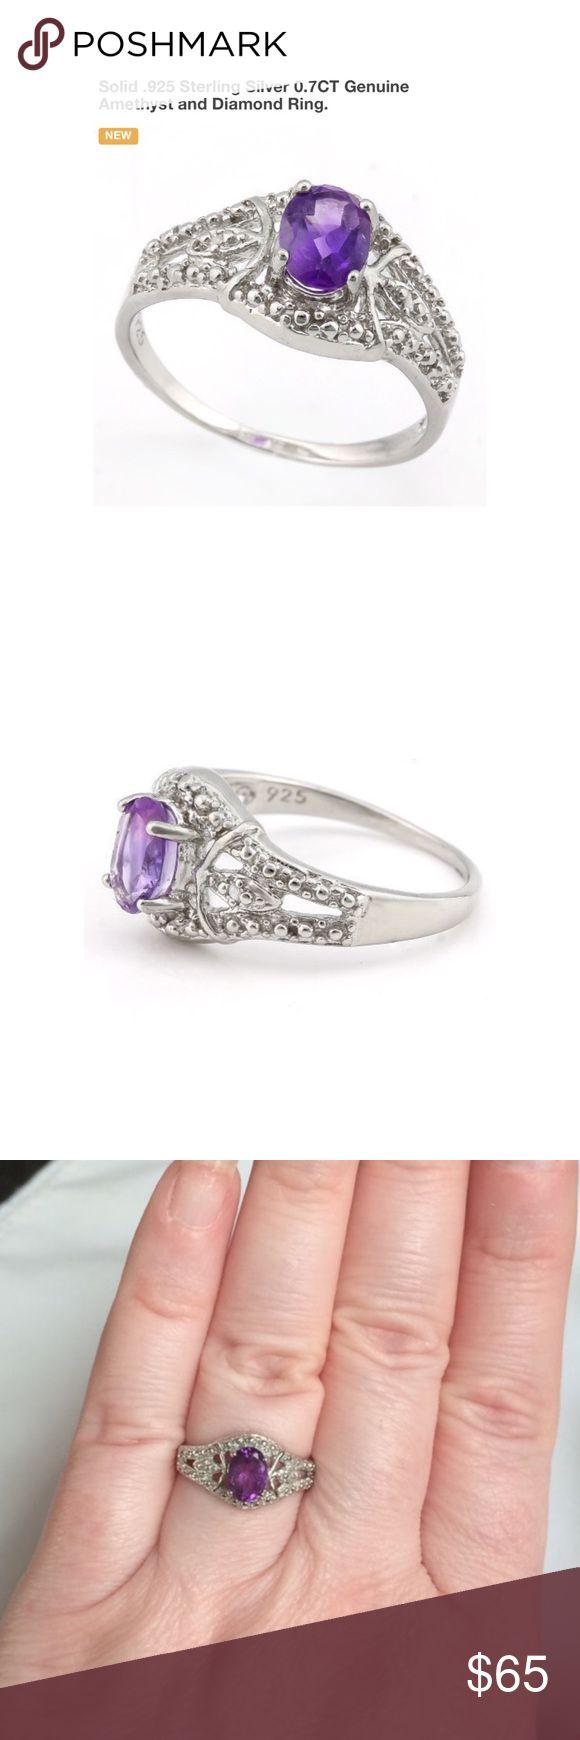 diamond ring price wedding ring Size 7 Genuine Amethyst Diamond Ring Boutique